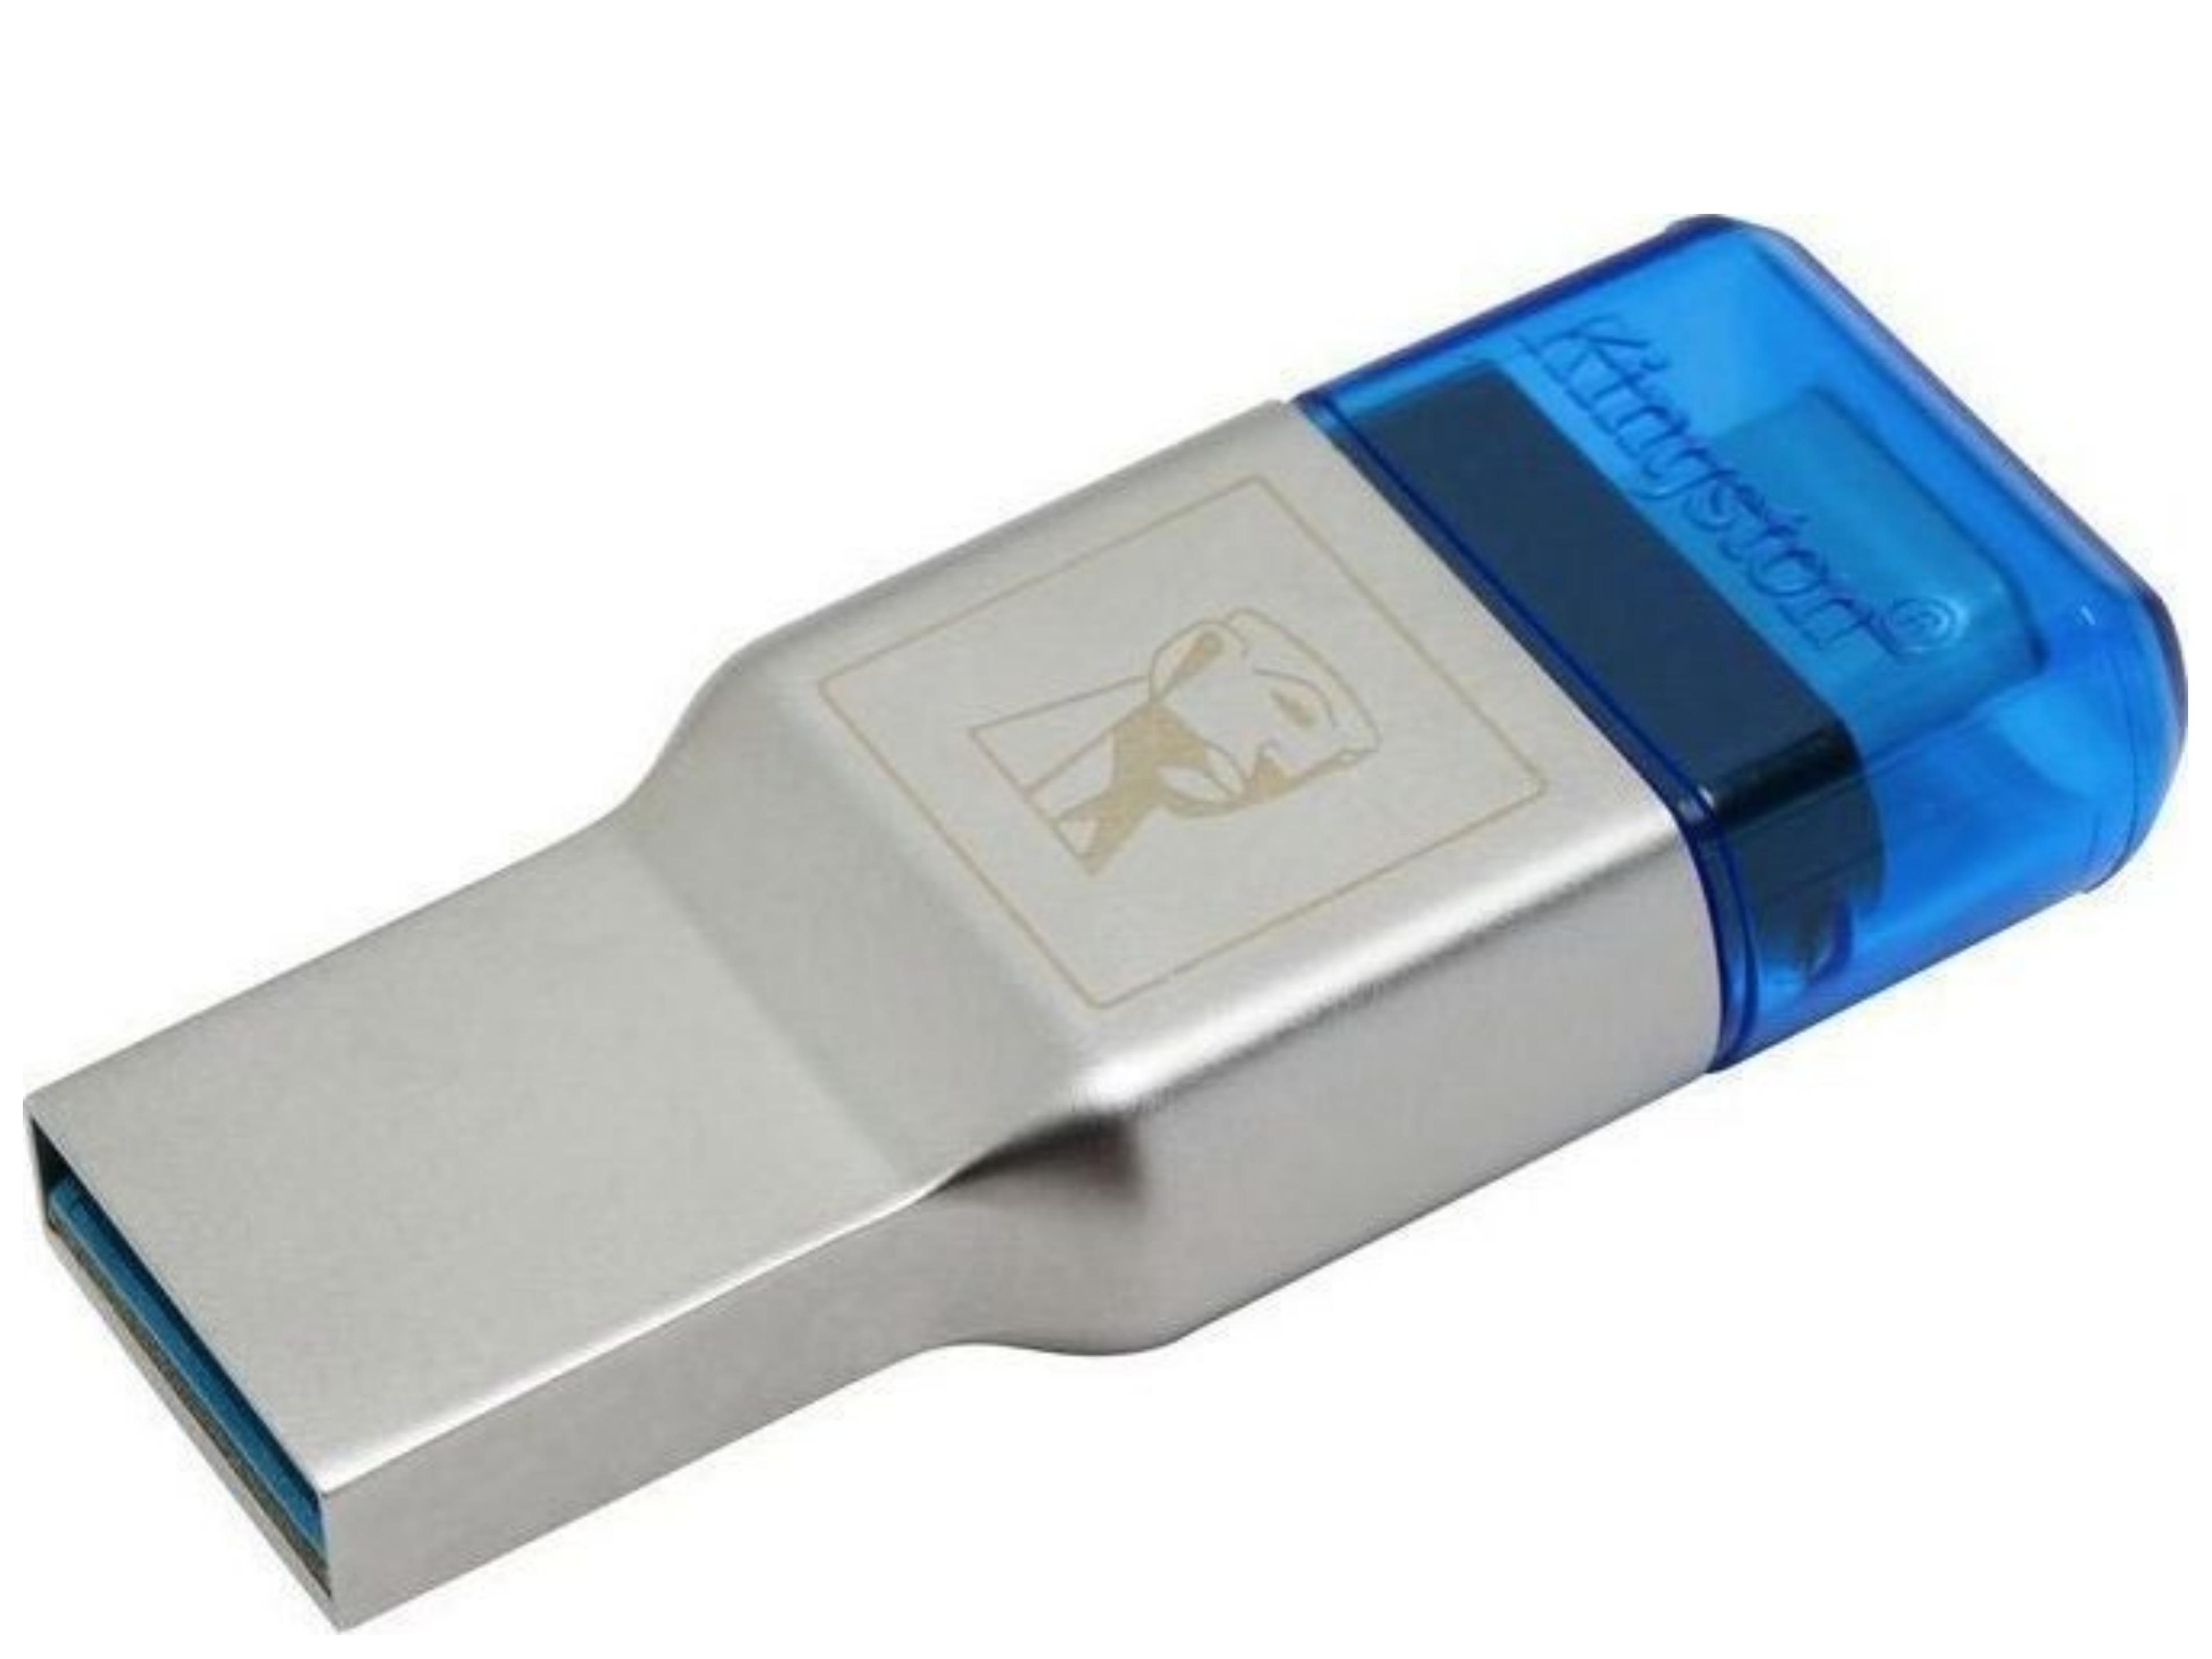 Kingston MobileLite Duo 3C Card Reader USB 3.1 Type-C για microSD Ασημί